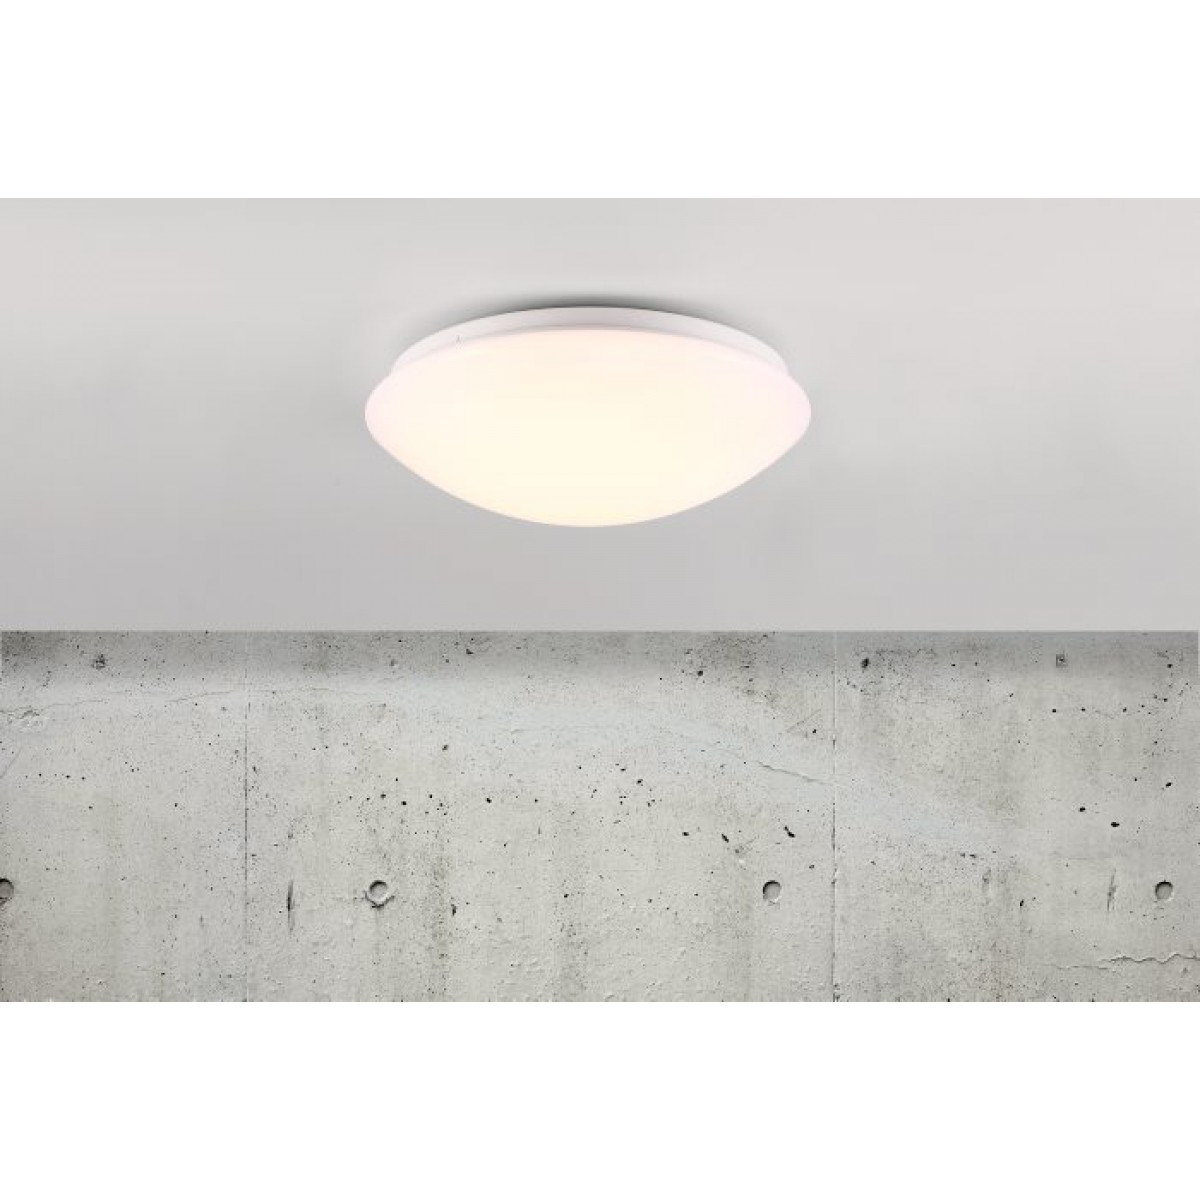 NORDLUXAskplafond28cm-01